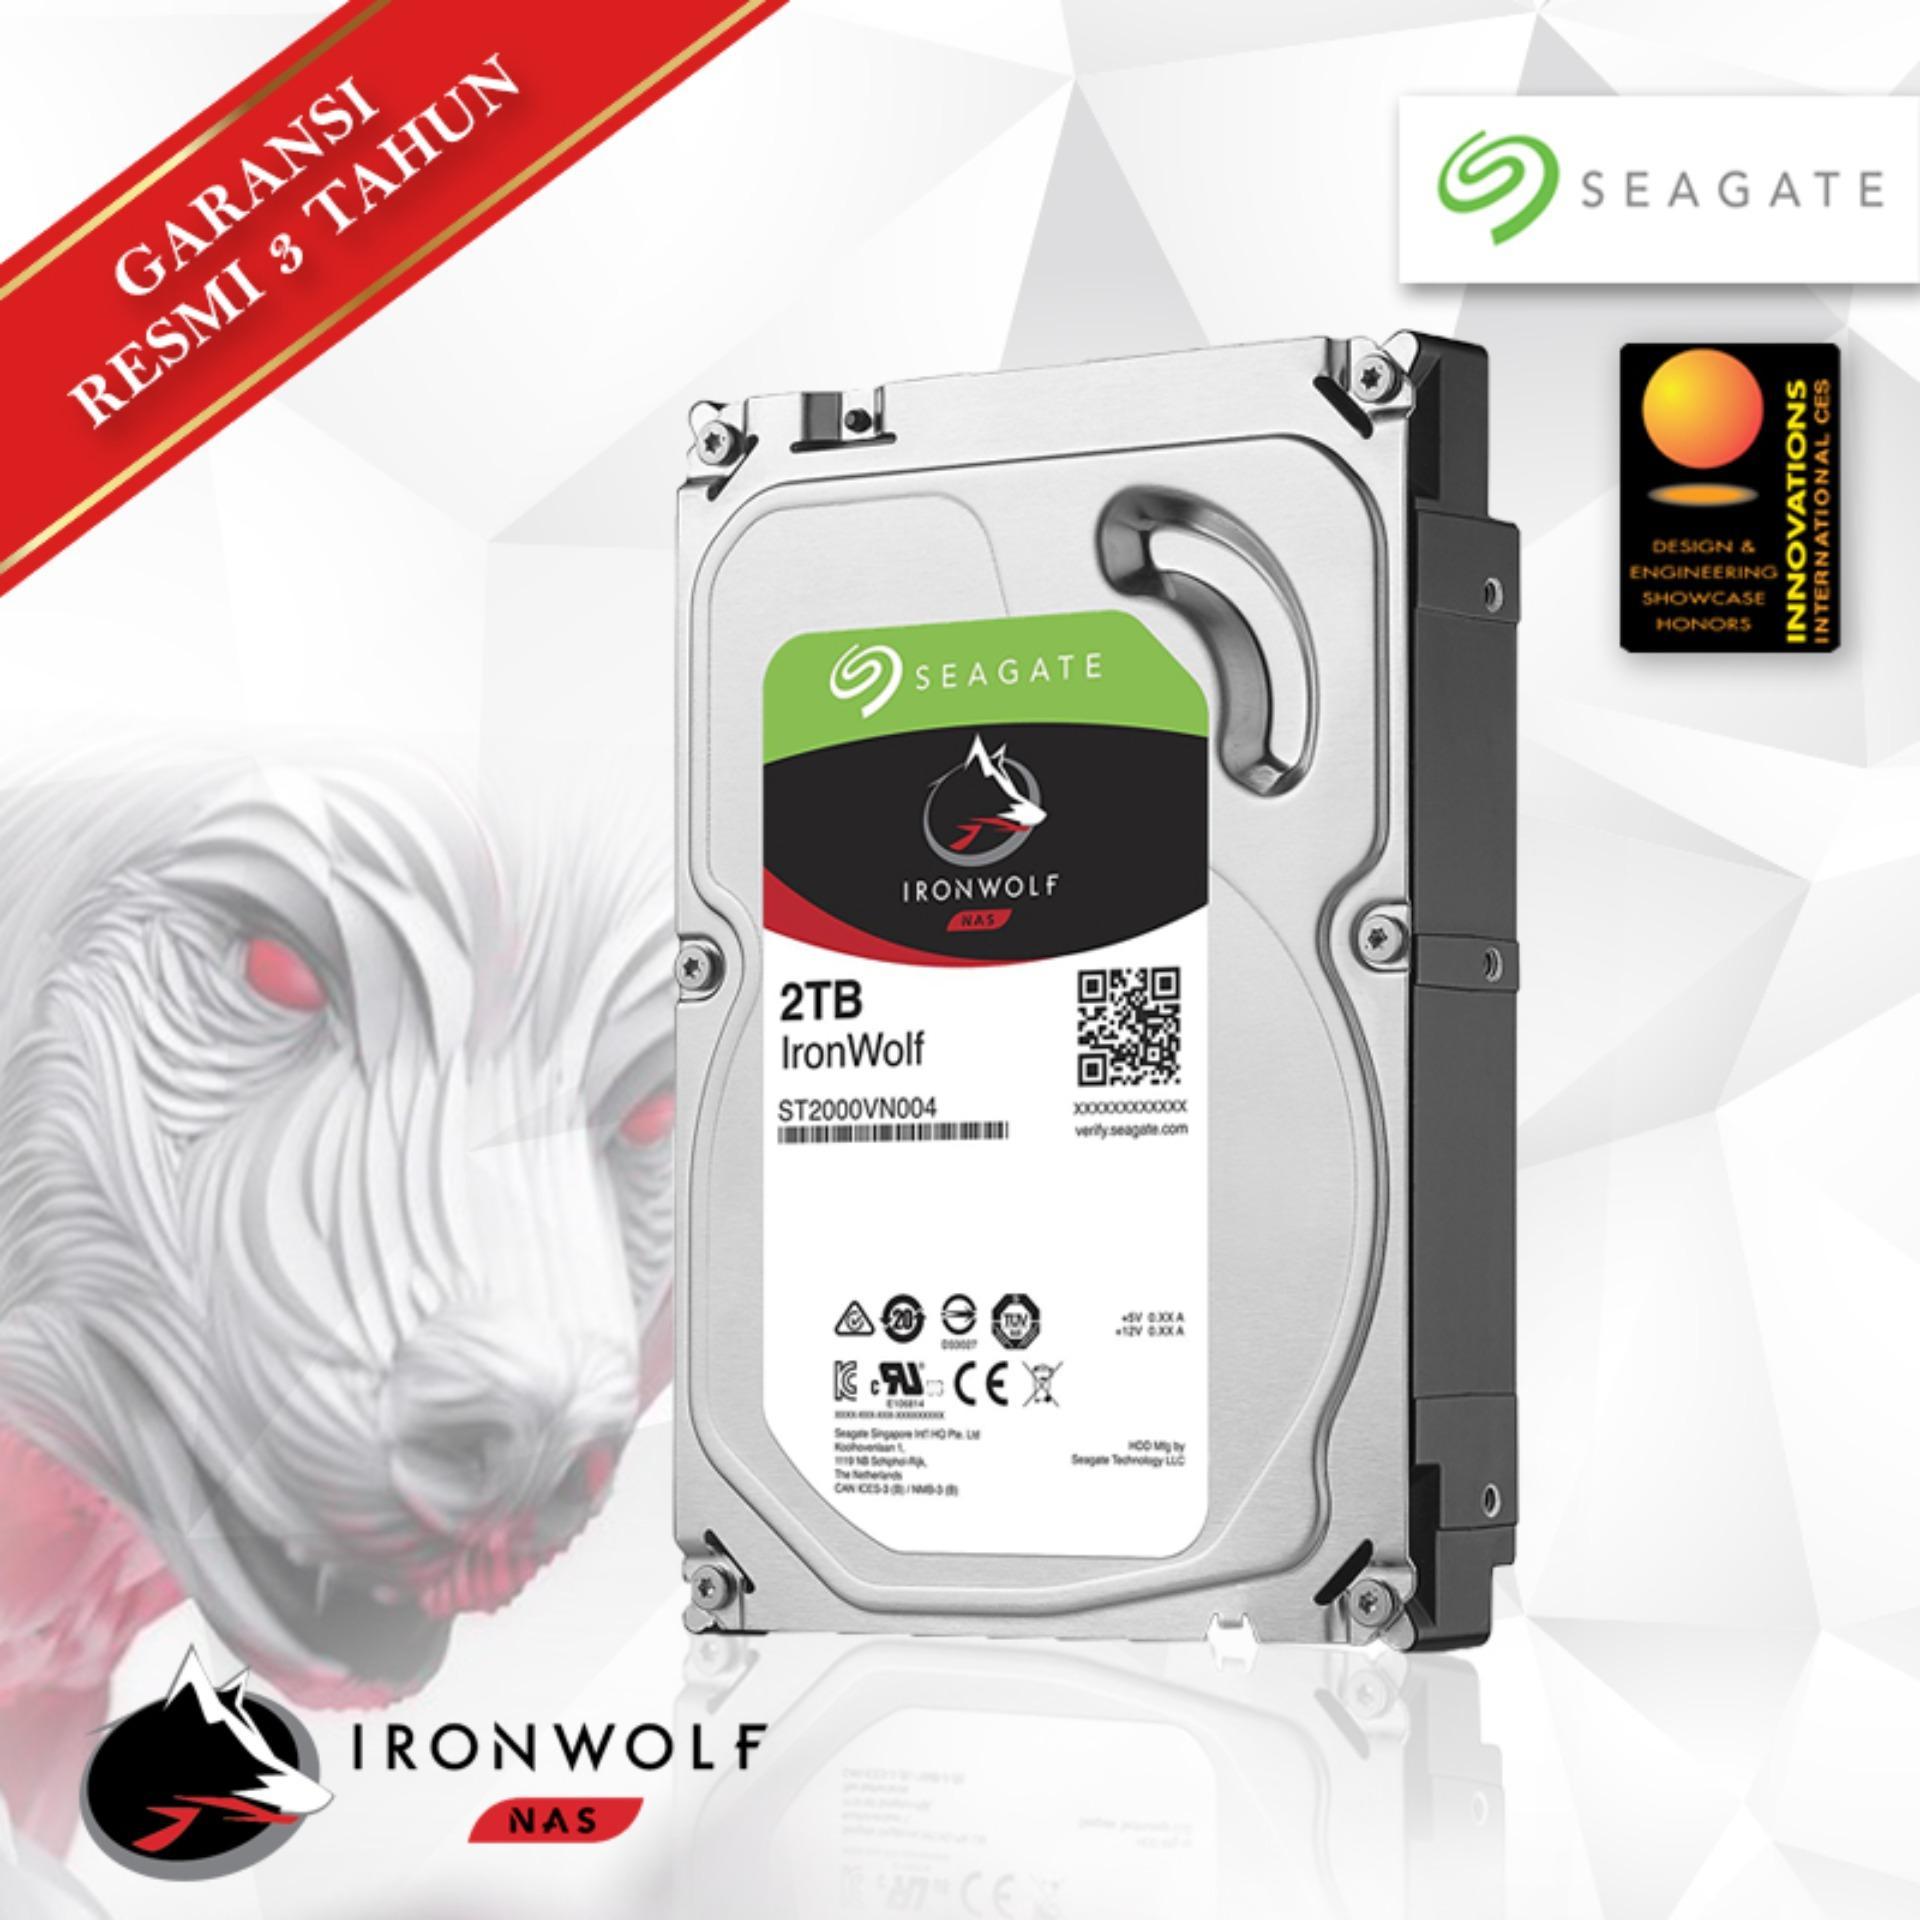 HDD Harddisk Internal PC Desktop Seagate Ironwolf 2TB 3.5 5900RPM - Hardisk Ironwolf series